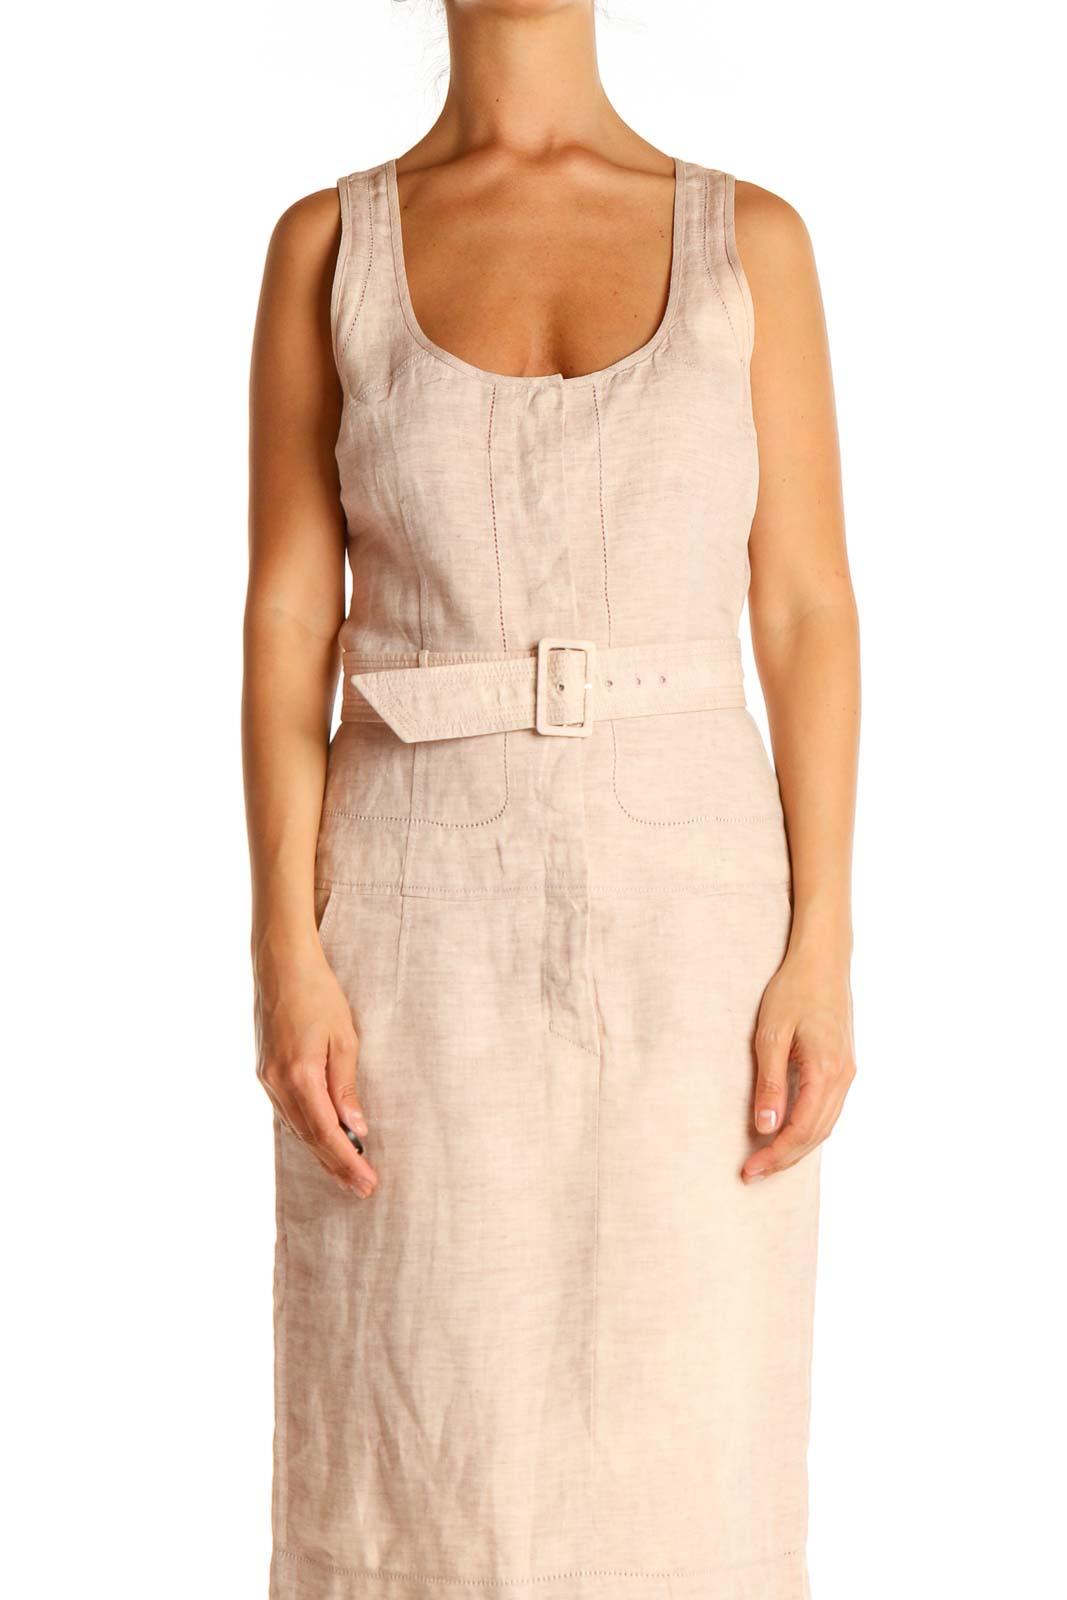 Pink Textured Sheath Dress Front